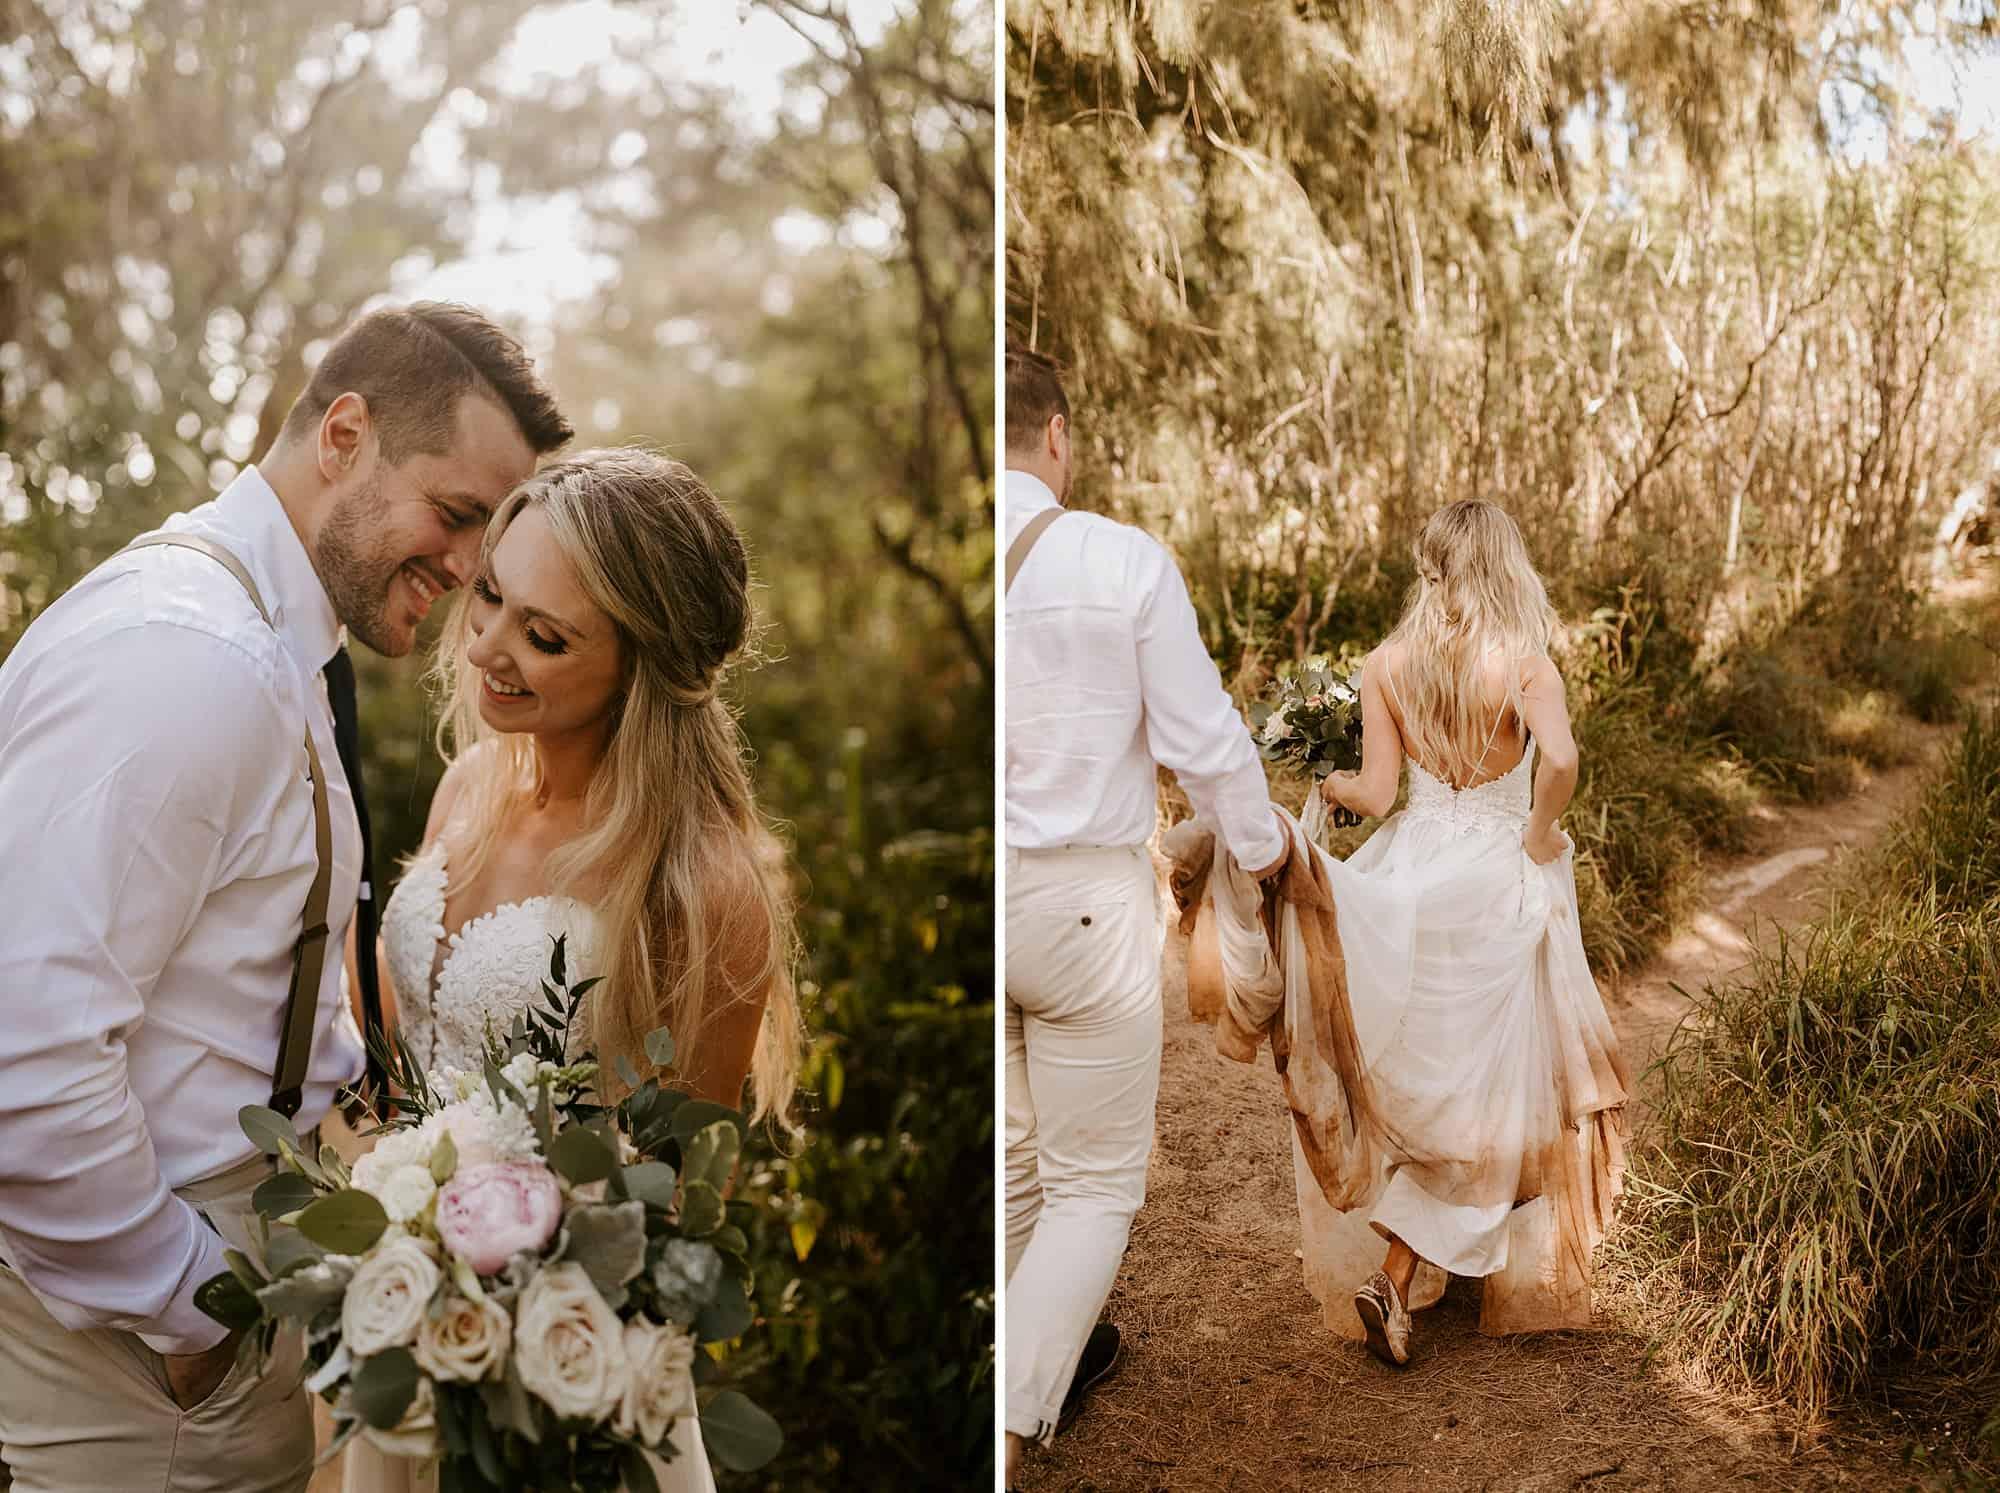 Kauai Hawaii Romantic Portraits Intimate Wedding